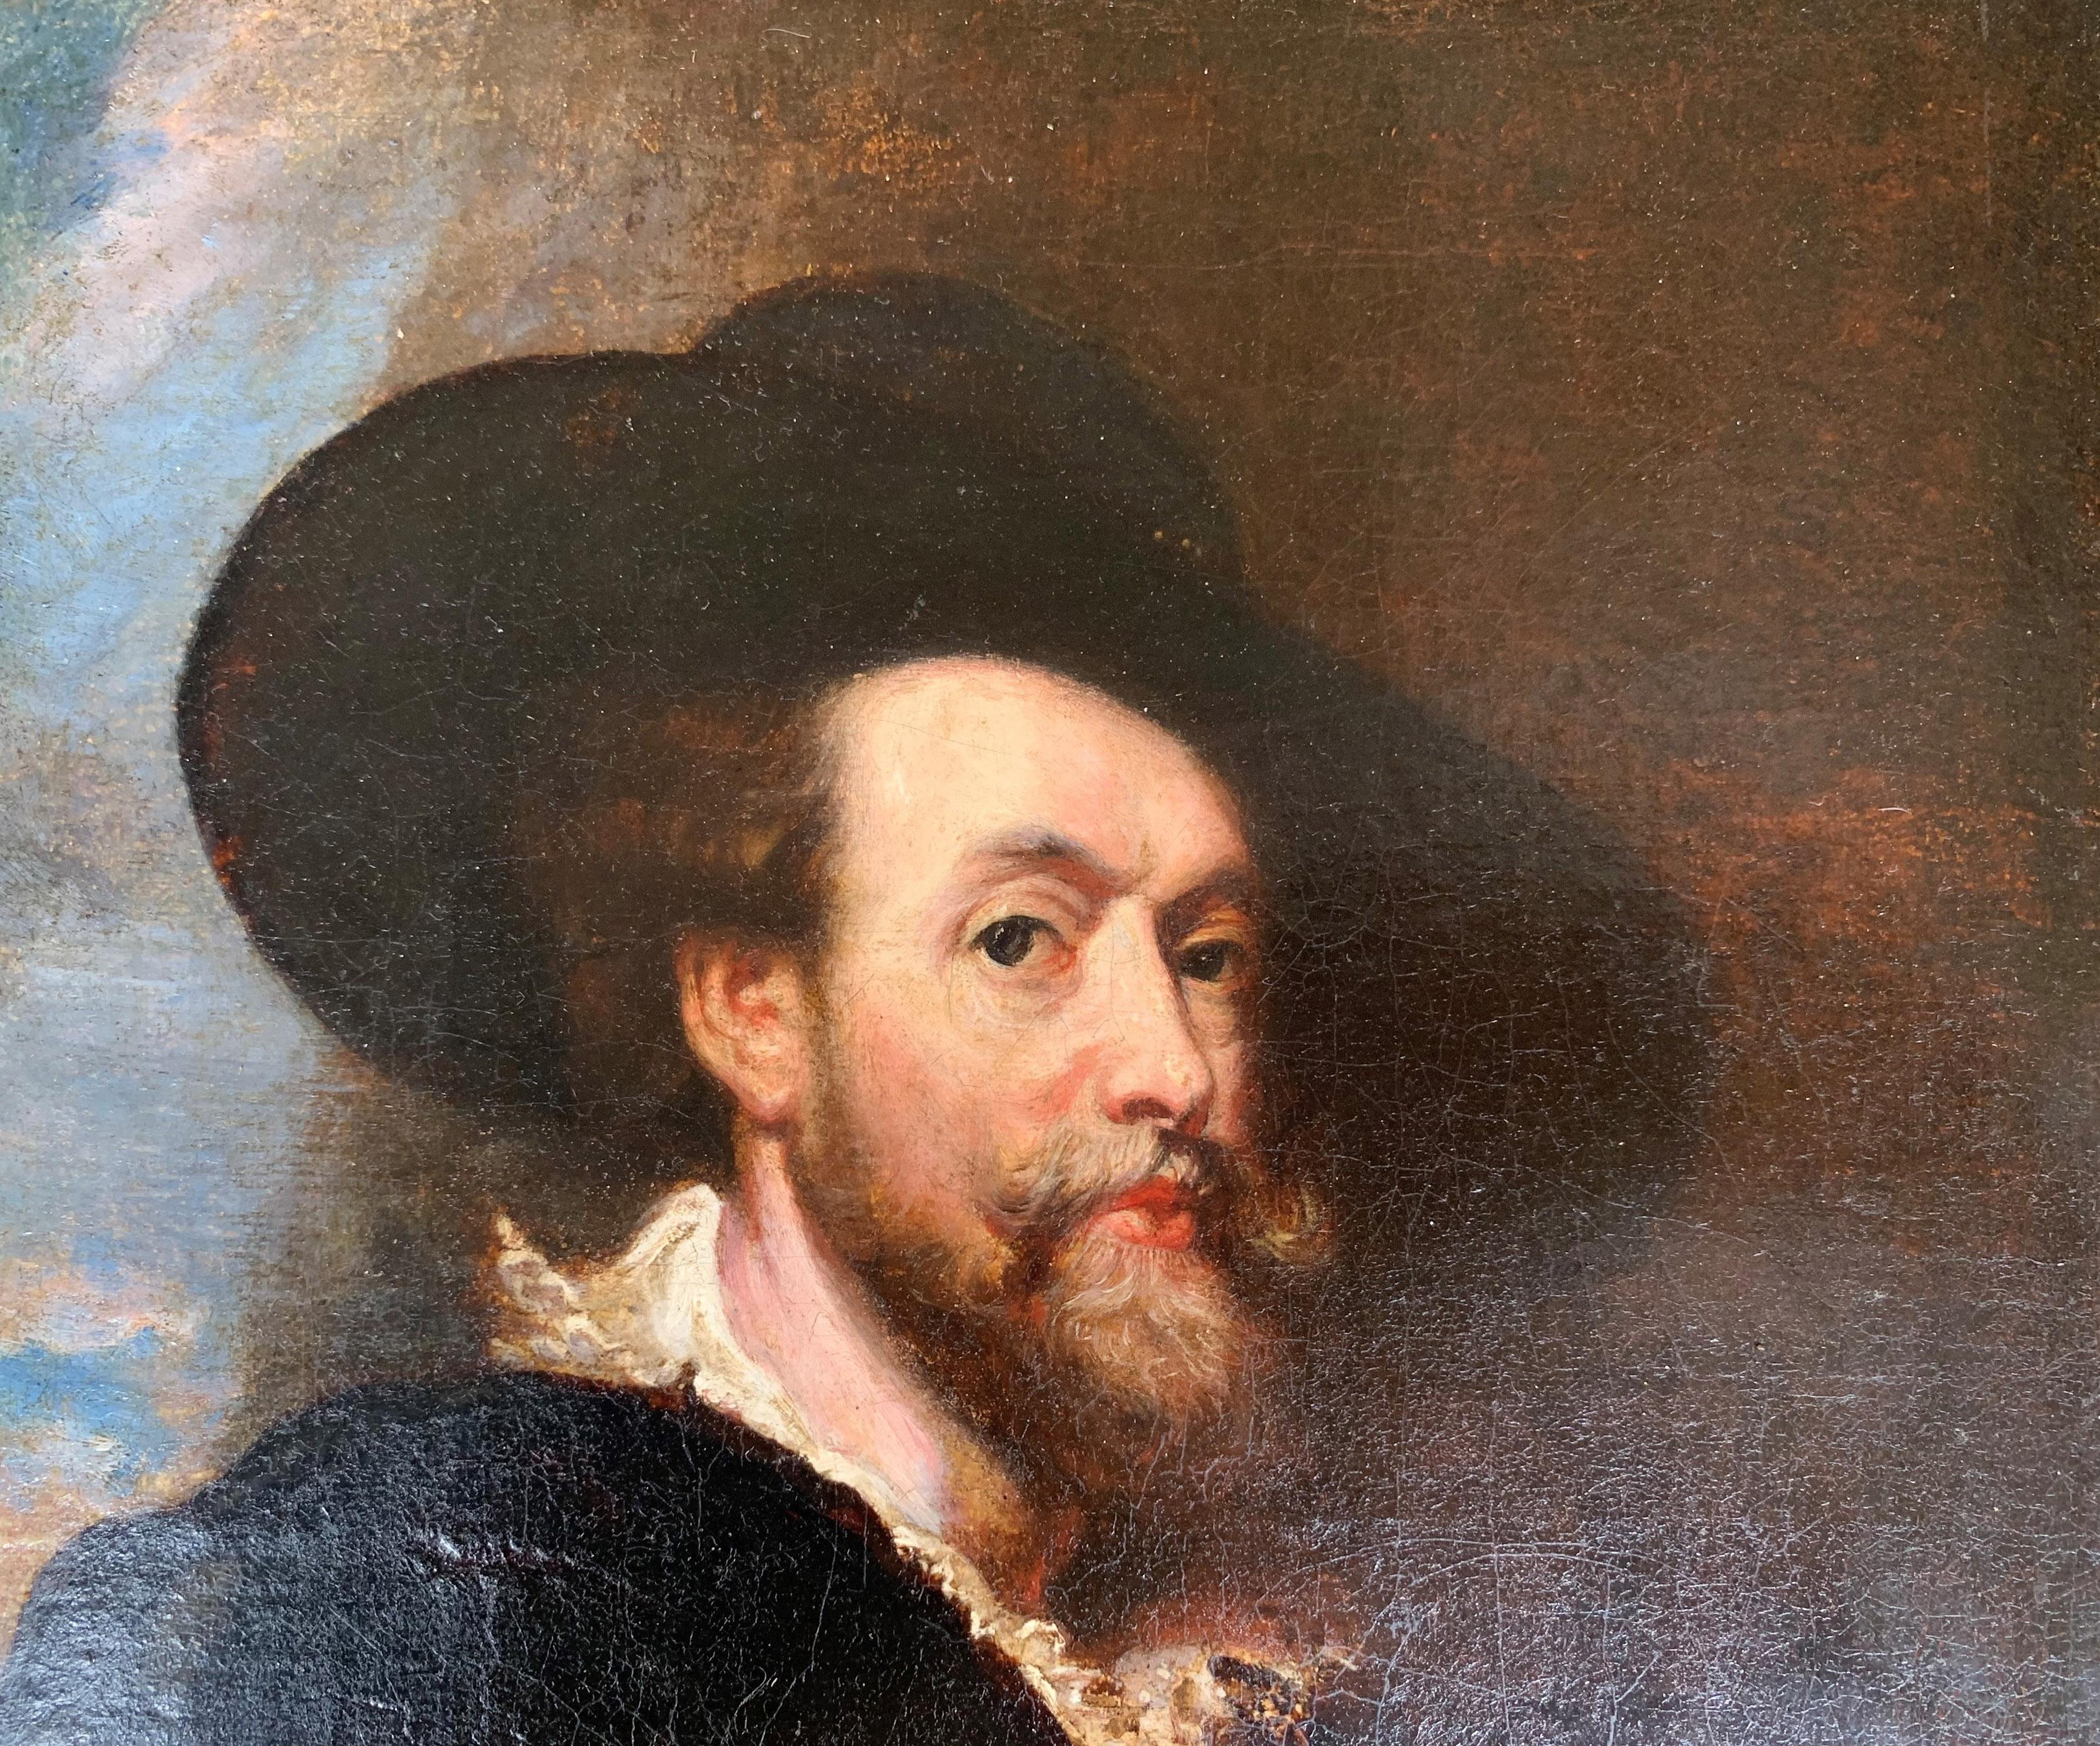 AFTER SIR PETER PAUL RUBENS, SIEGEN, 1577 - 1640, ANTWERP, 17TH CENTURY OIL ON CANVAS Self - Image 4 of 11